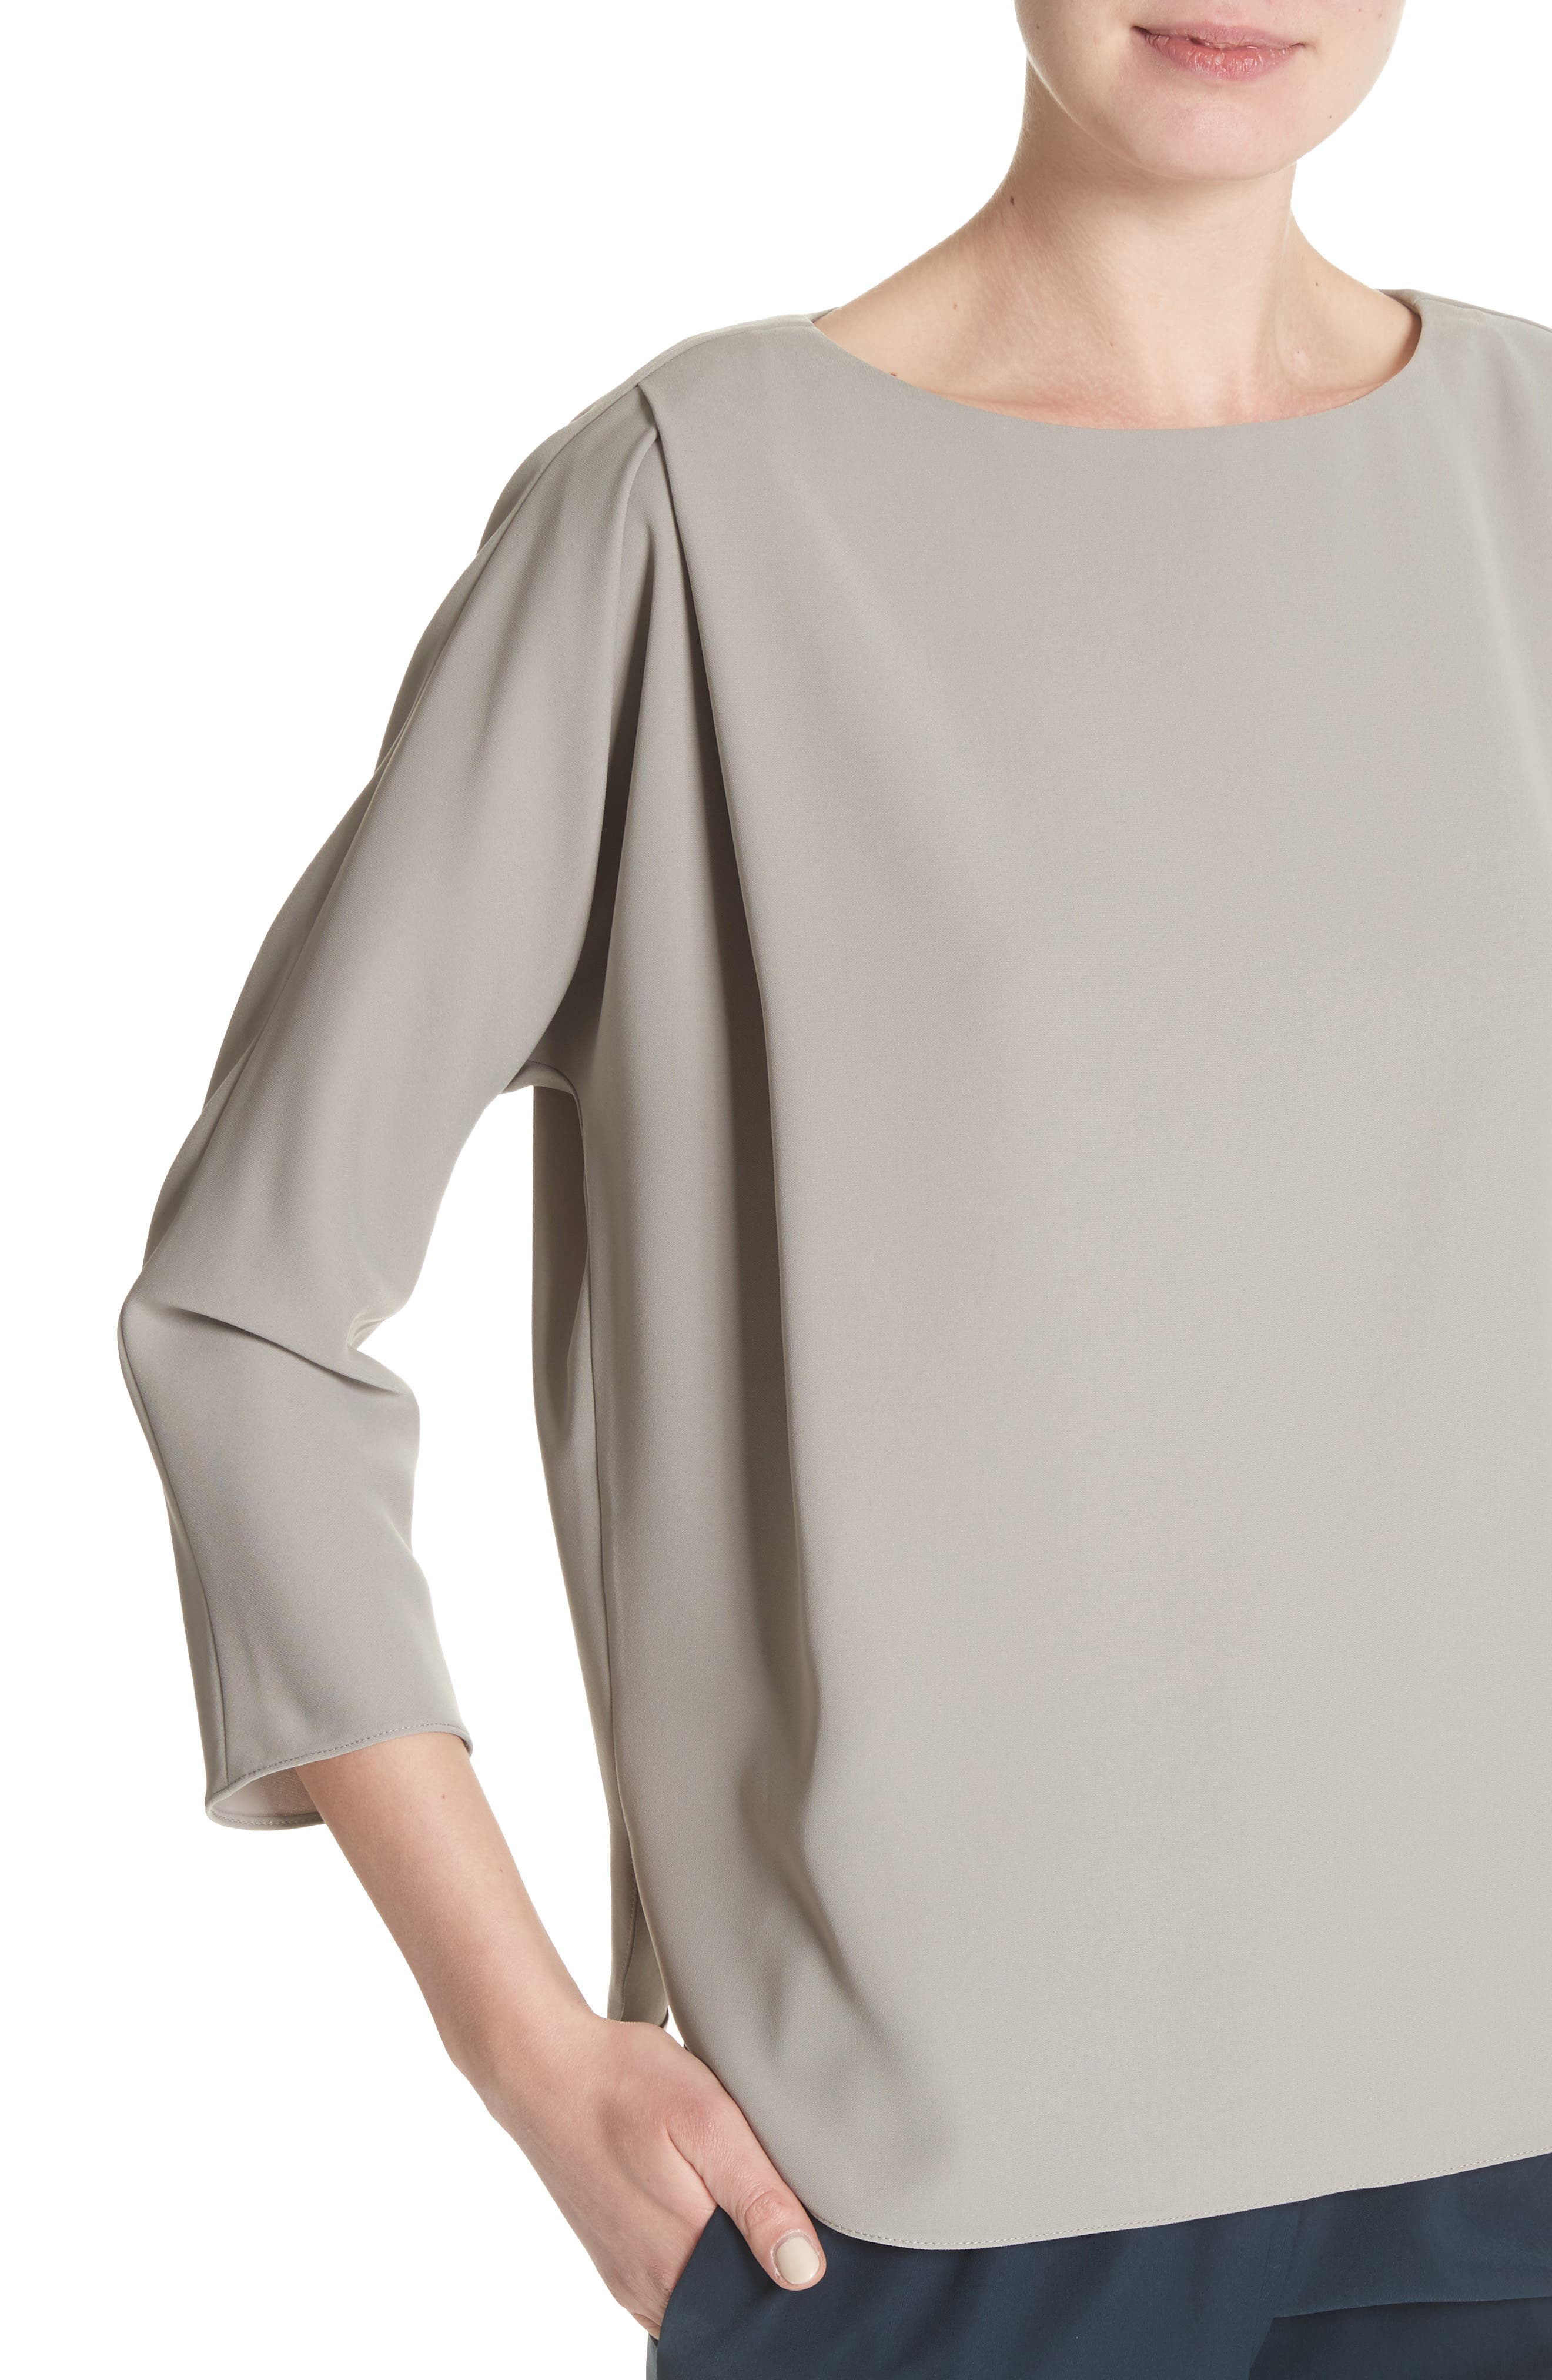 Dolman Sleeve Top,                             Alternate thumbnail 4, color,                             054